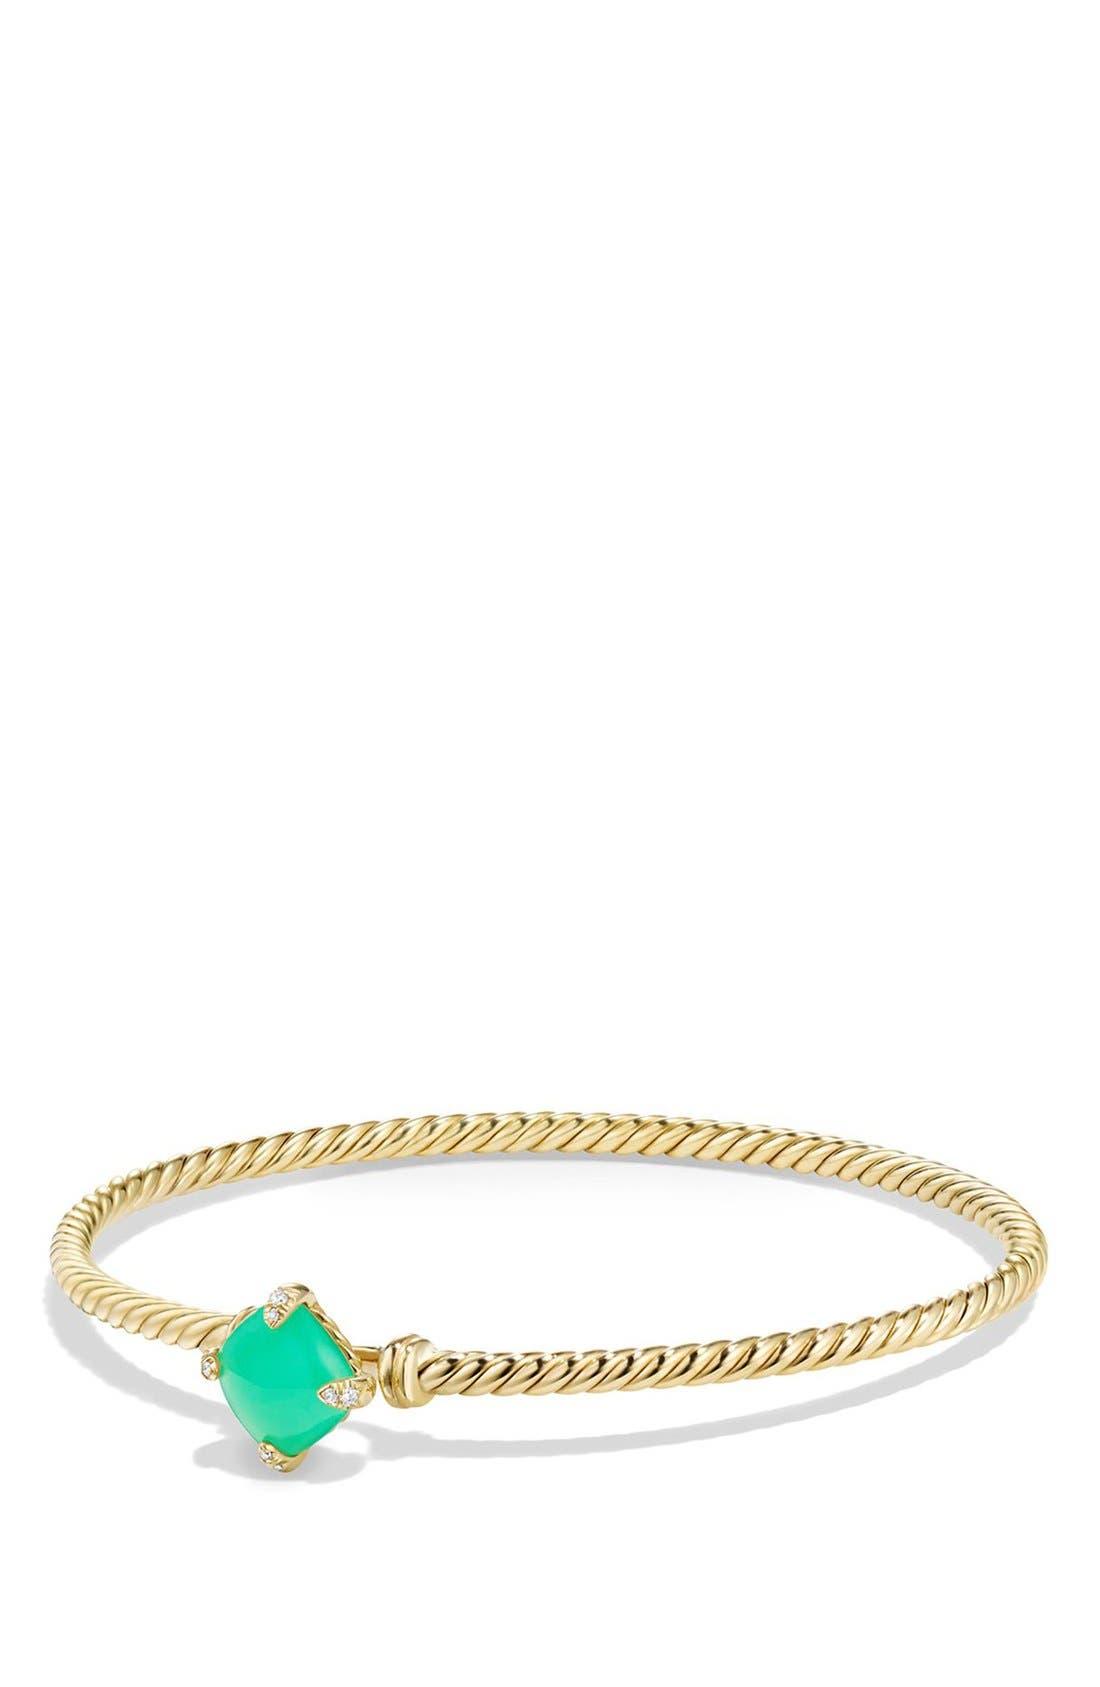 DAVID YURMAN 'Châtelaine' Bracelet in 18K Gold with Diamonds, Main, color, CHRYSOPRASE